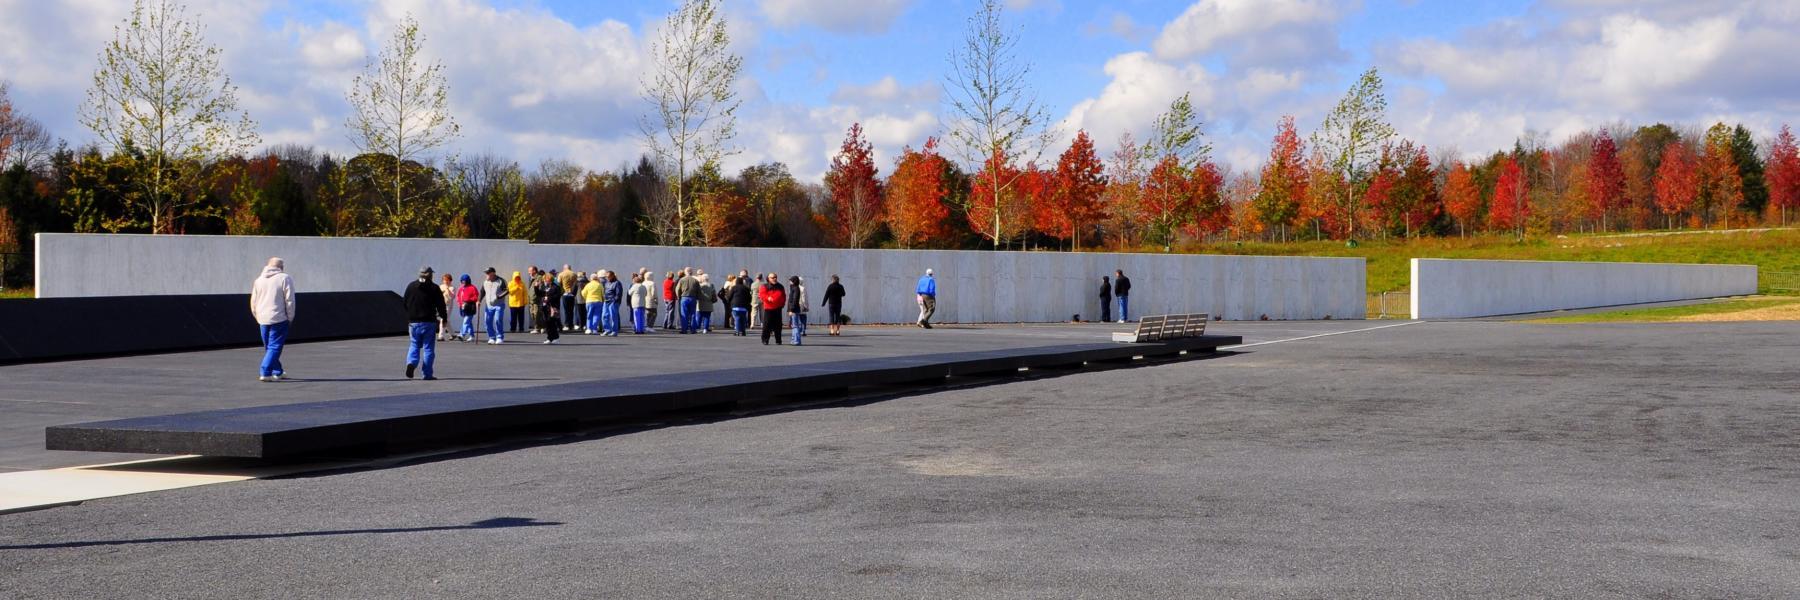 Flight 93 National Memorial -  <br />  Visit the New Visitor Center